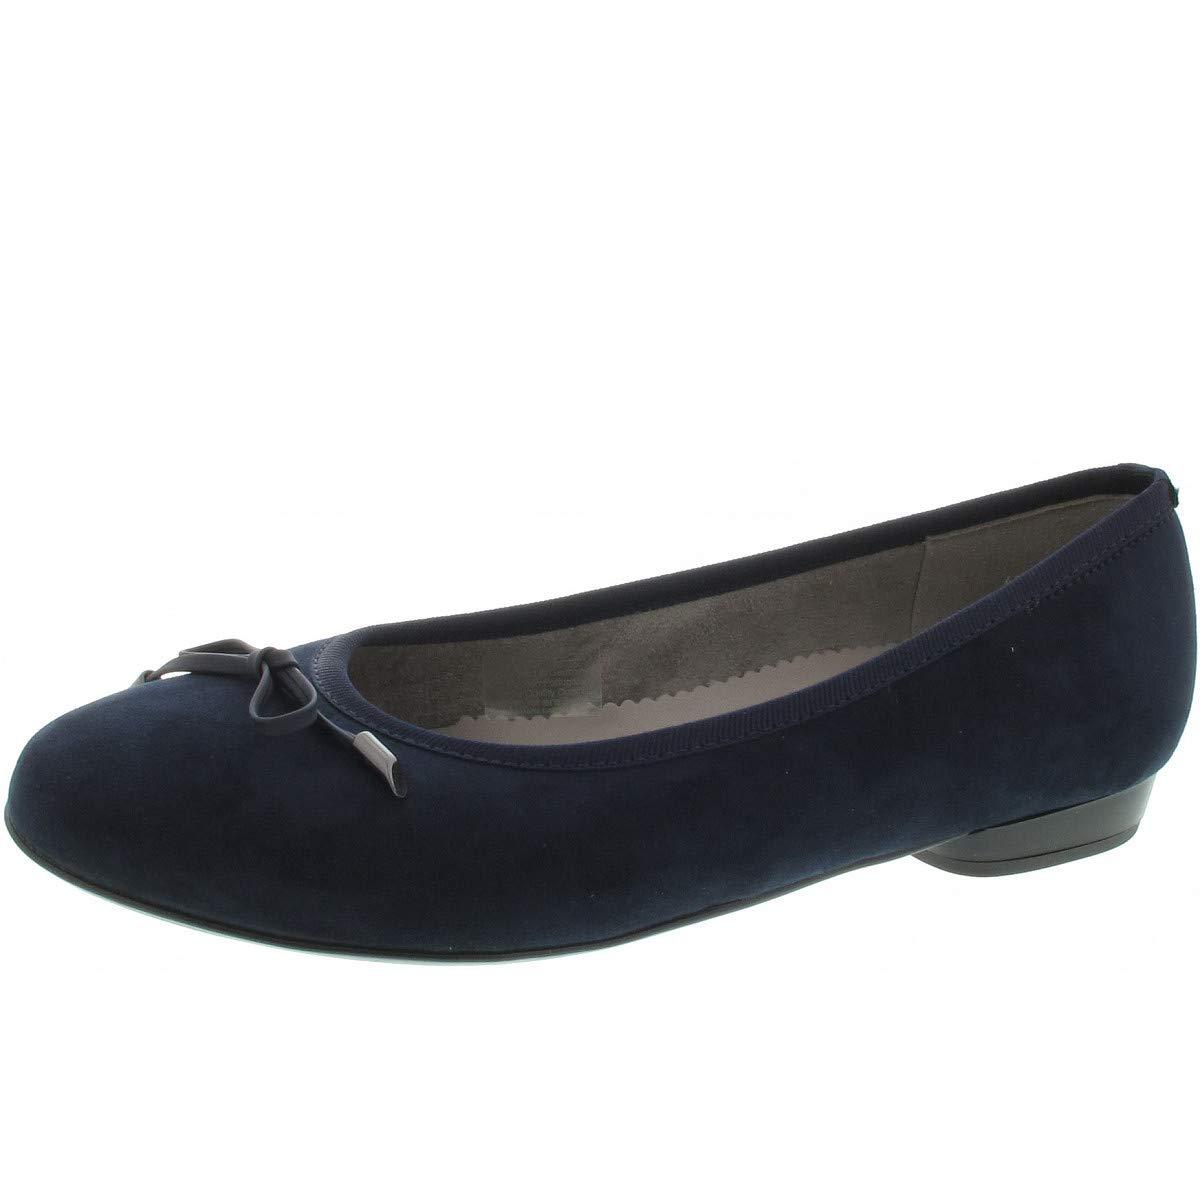 Blau (Blau) Jenny Damen Pisa Geschlossene Ballerinas